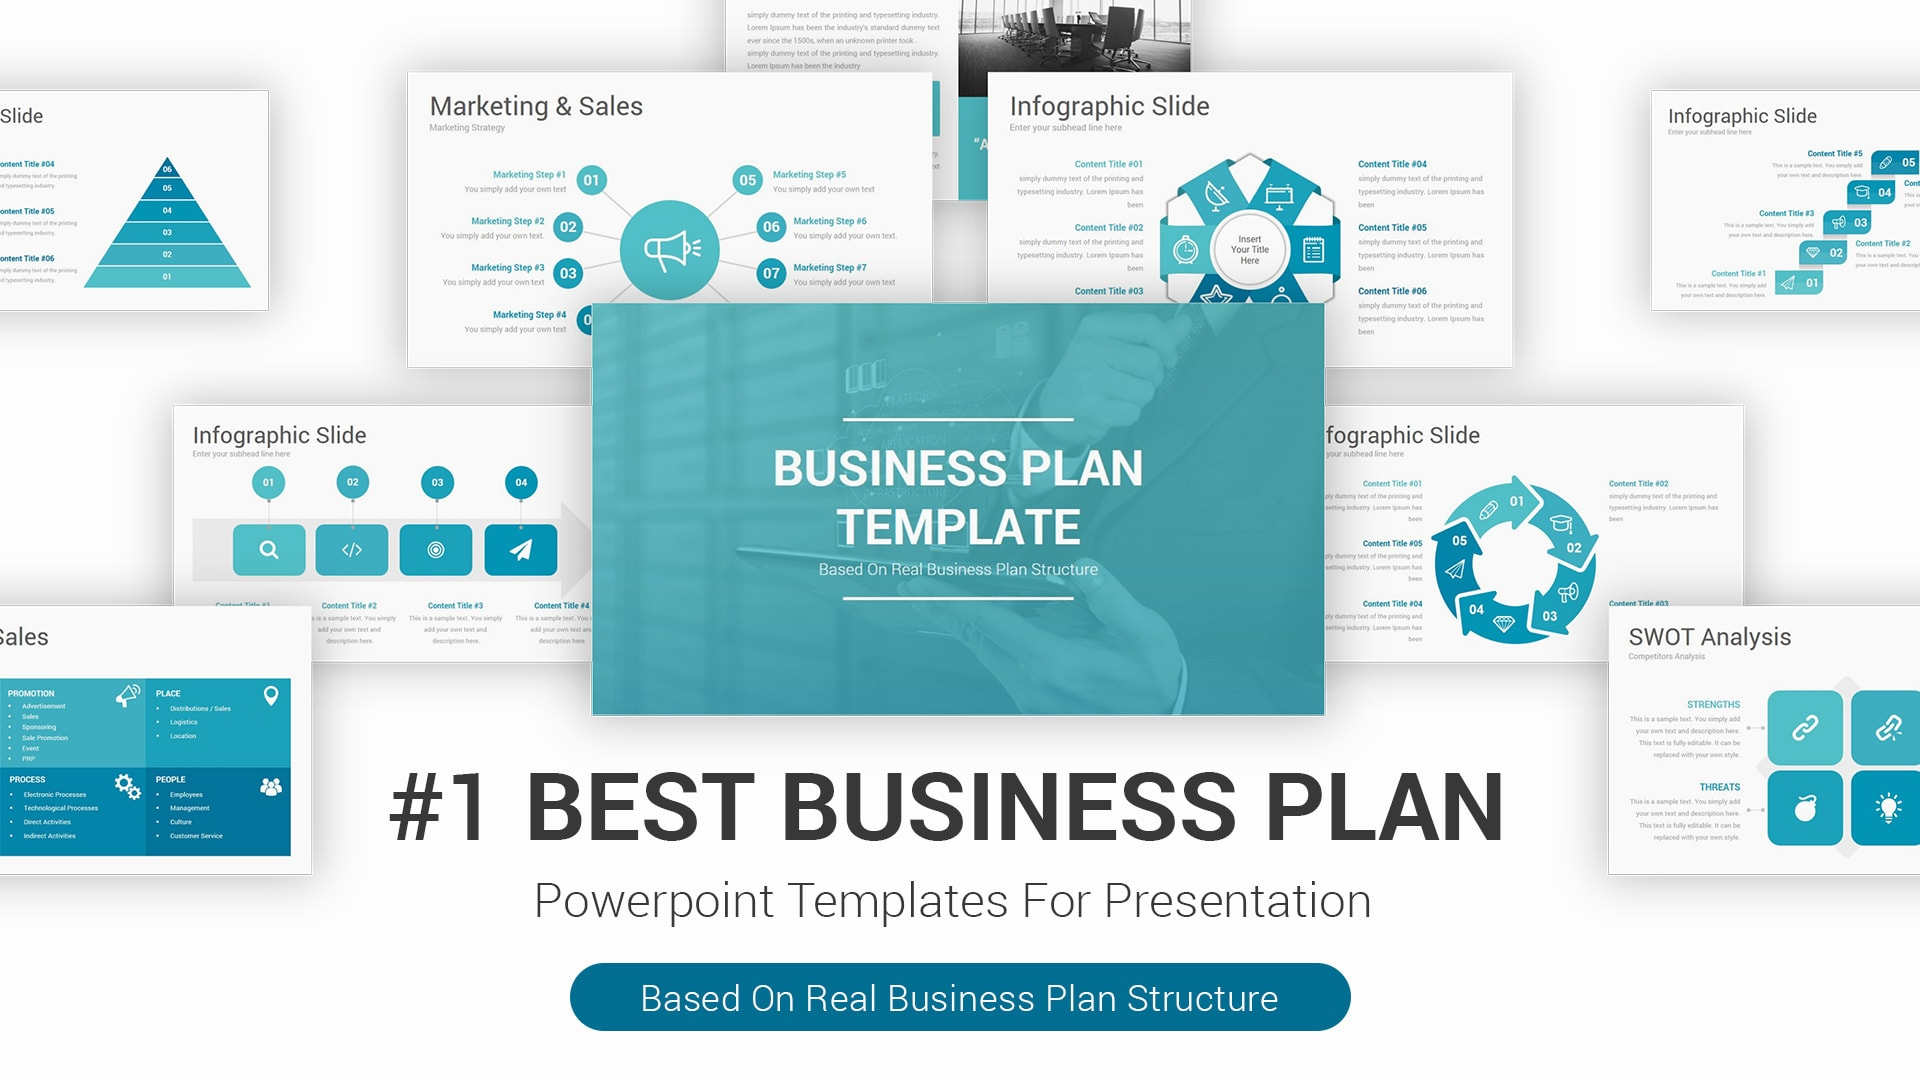 Best Business Plan Powerpoint Presentation Templates 2020